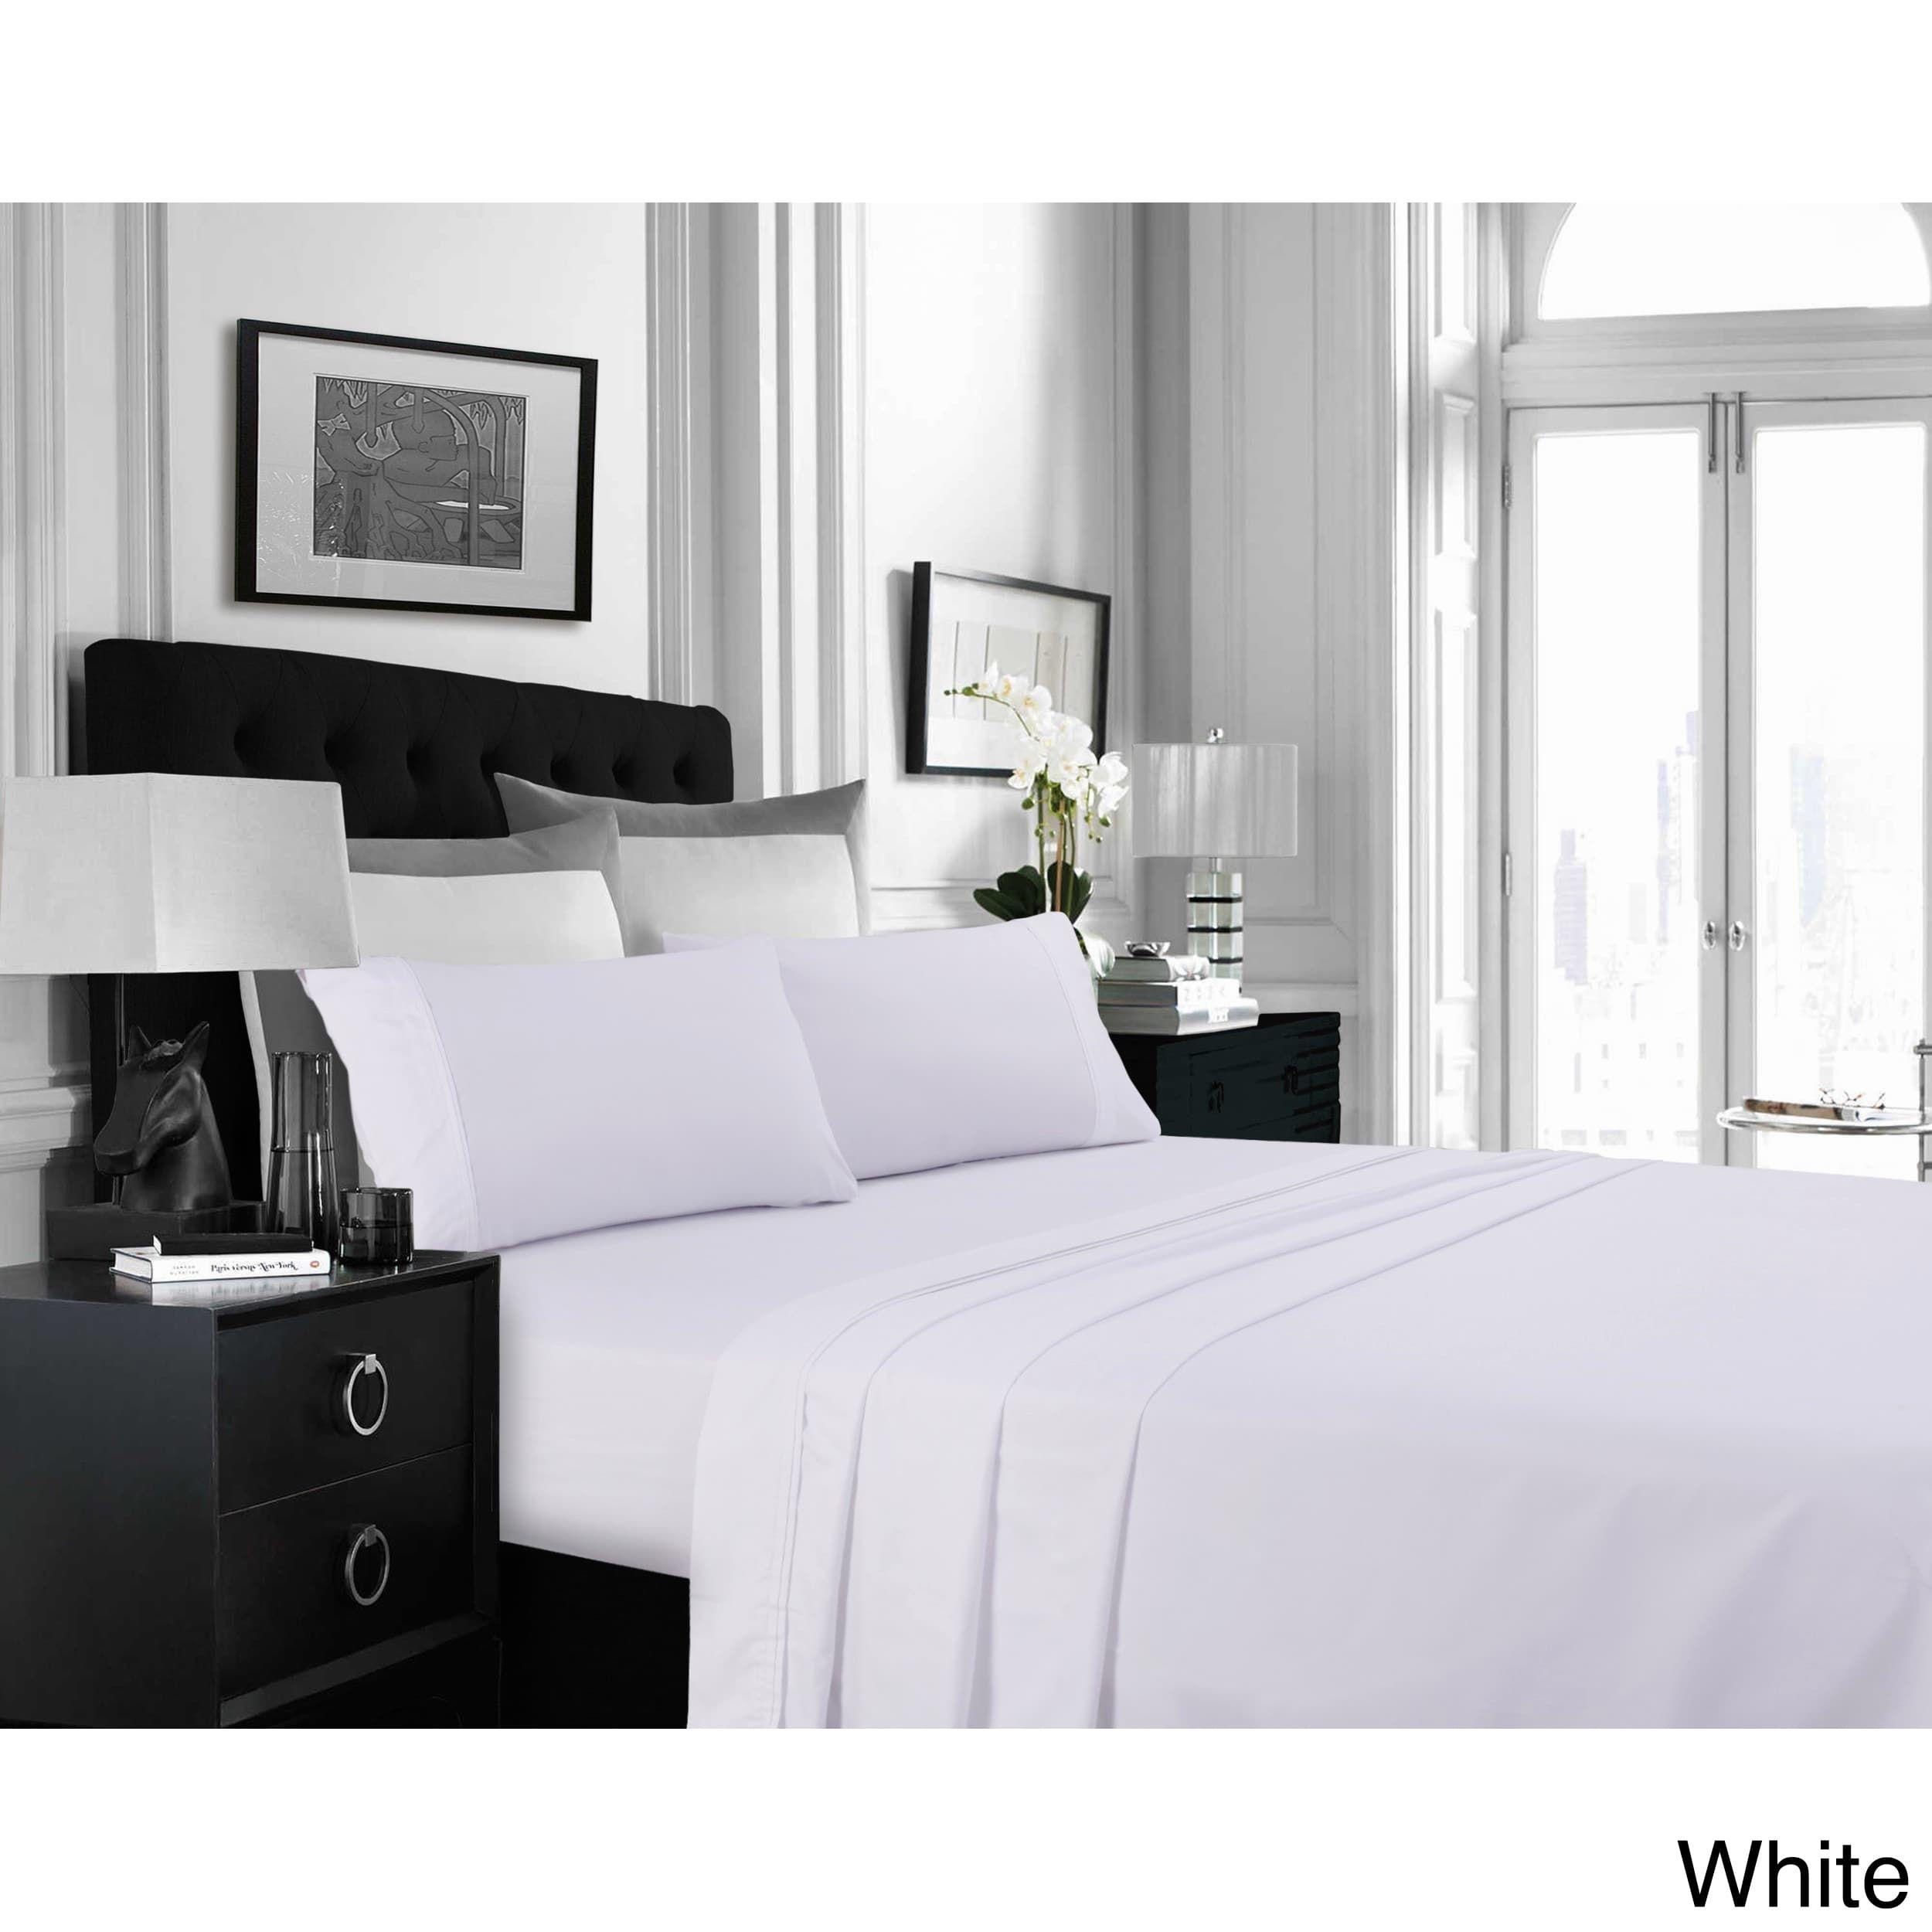 Super Soft Extra Deep Pocket Easycare Bed Sheet Set with